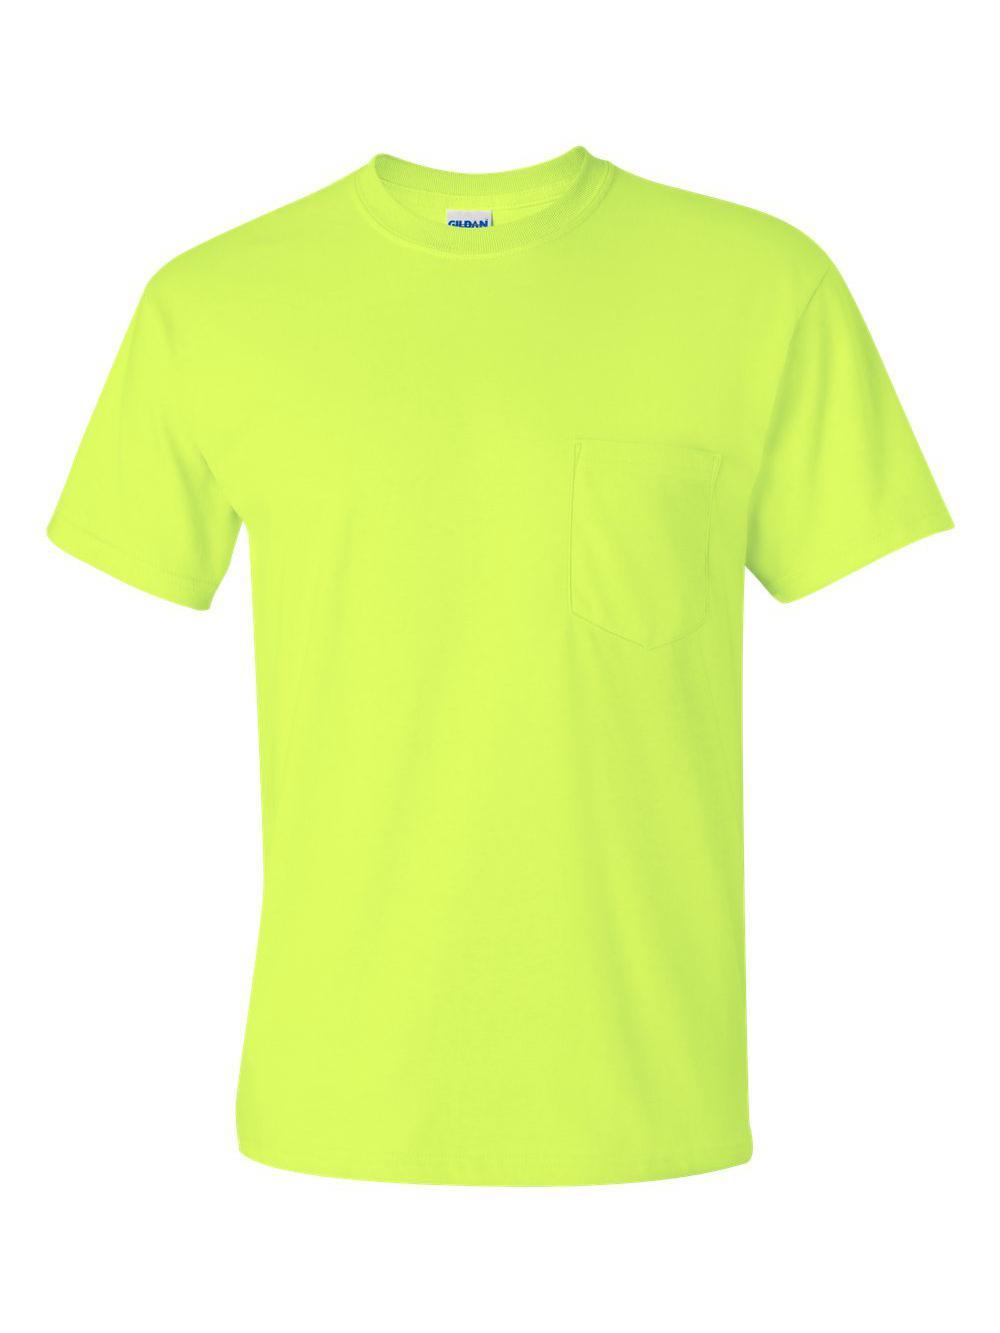 Gildan-Ultra-Cotton-T-Shirt-with-a-Pocket-2300 thumbnail 33